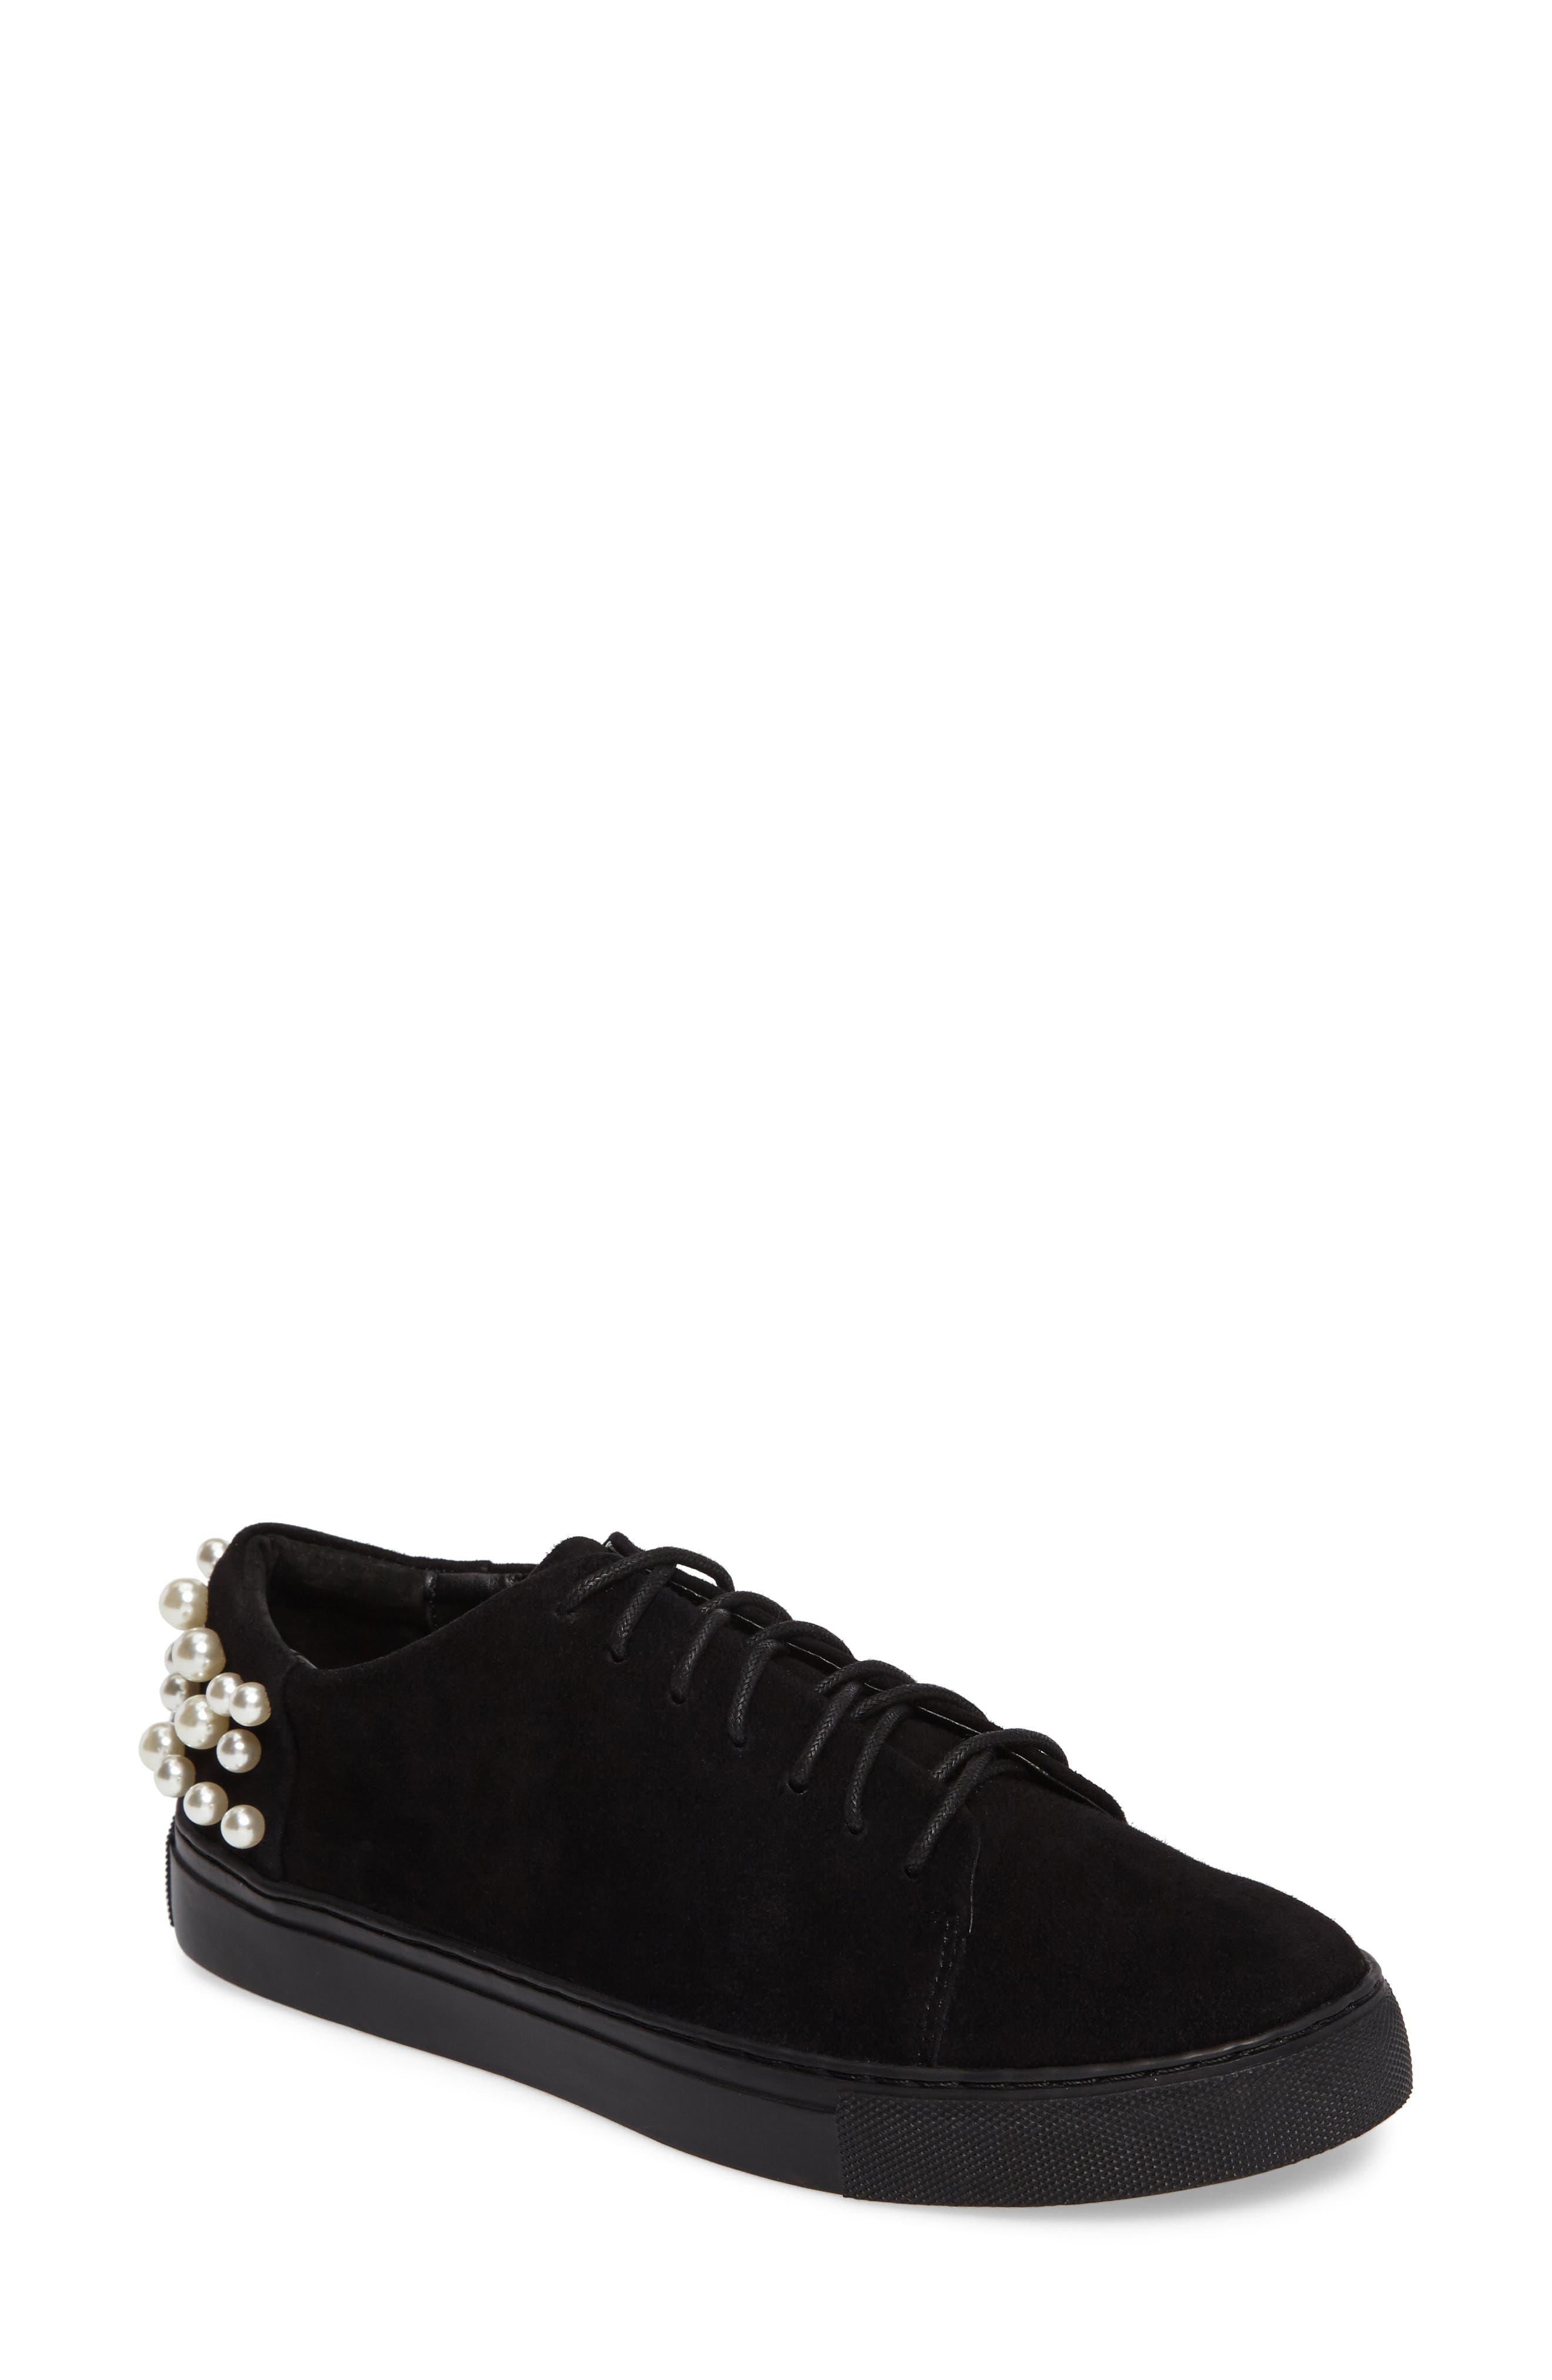 Haig Embellished Sneaker,                             Main thumbnail 1, color,                             Black